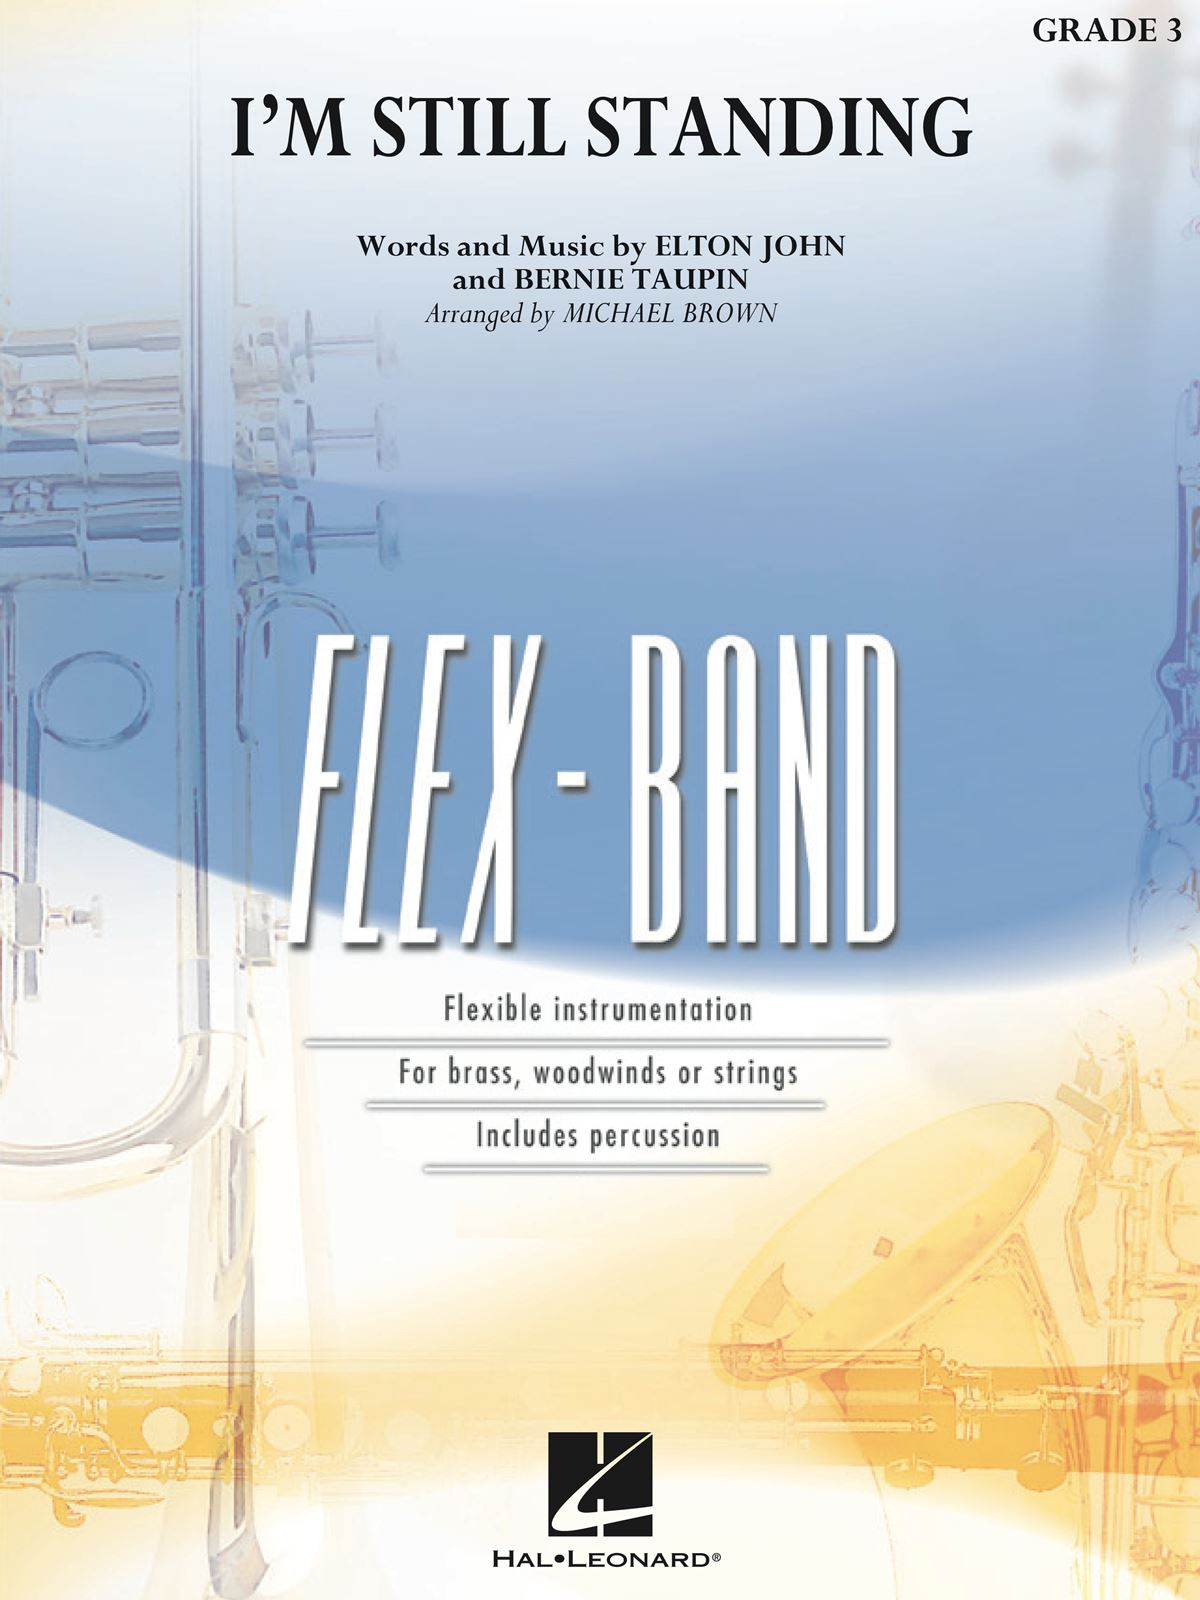 Bernie Taupin: I'm Still Standing: Flexible Ensemble: Score and Parts